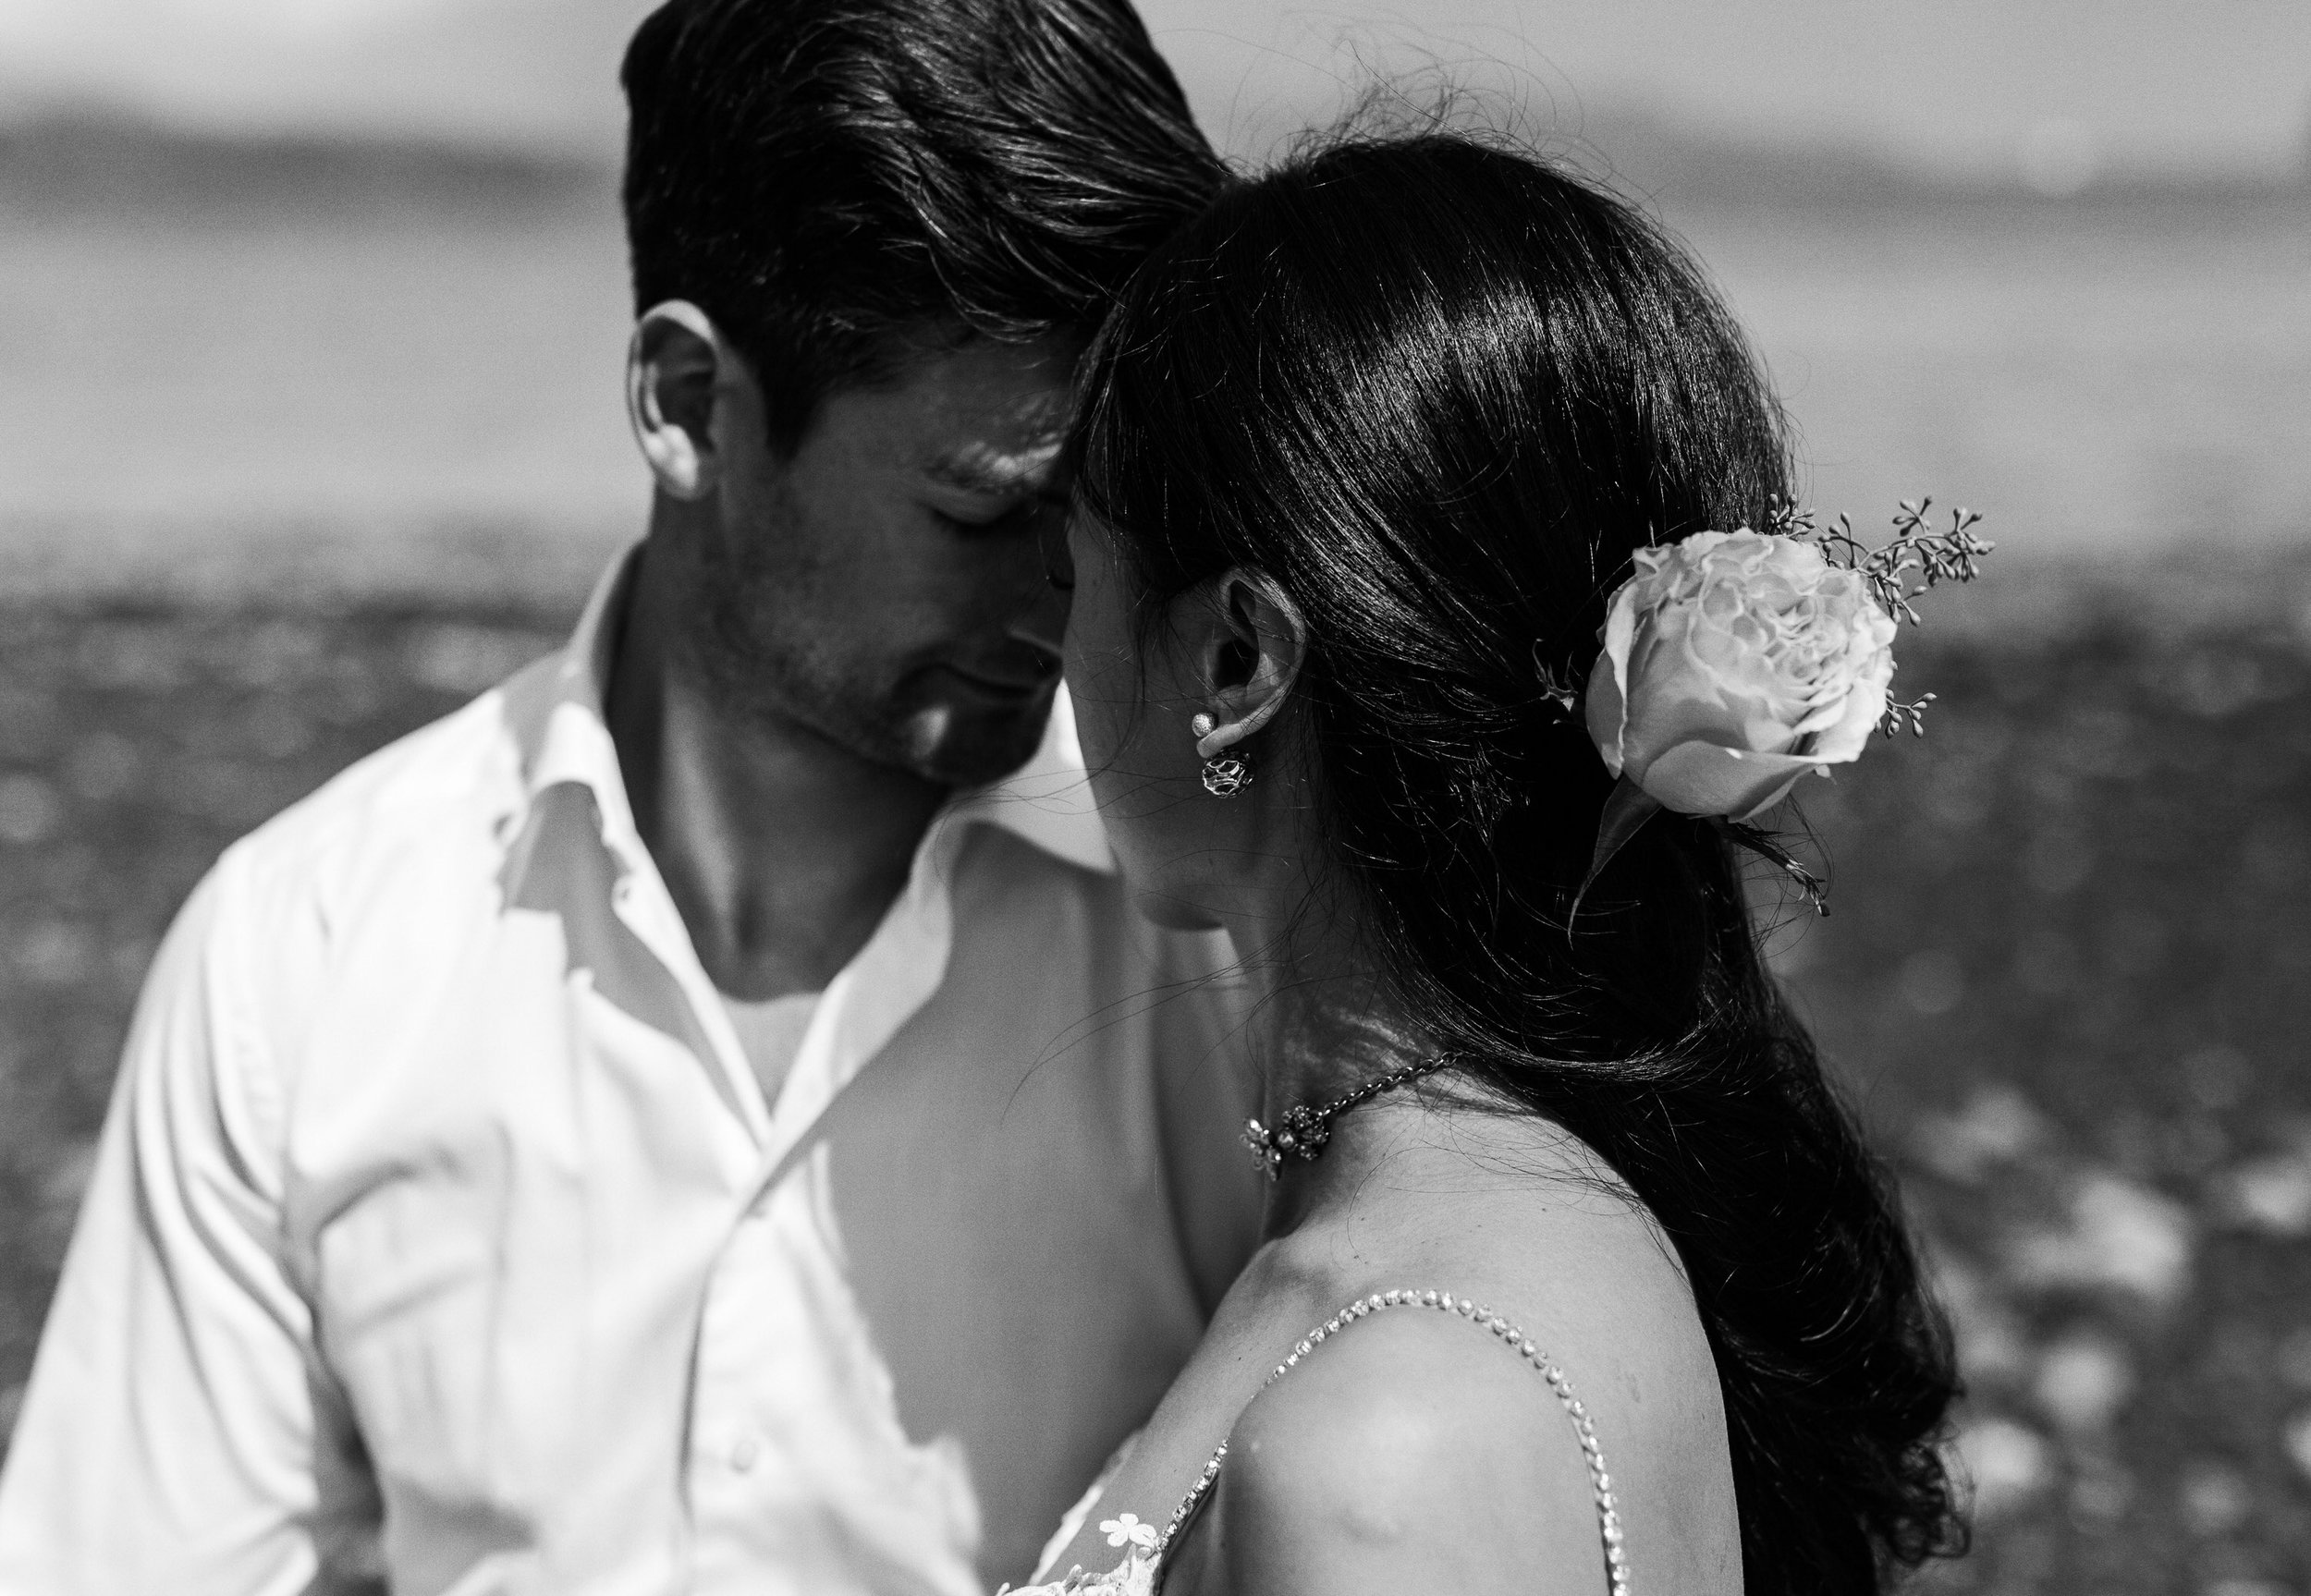 Gibsons Wedding Photos - Sunshine Coast Wedding Photos - Vancouver Wedding Photographer & Videographer - Sunshine Coast Wedding Photos - Sunshine Coast Wedding Photographer - Jennifer Picard Photography - IMG_9744.jpg